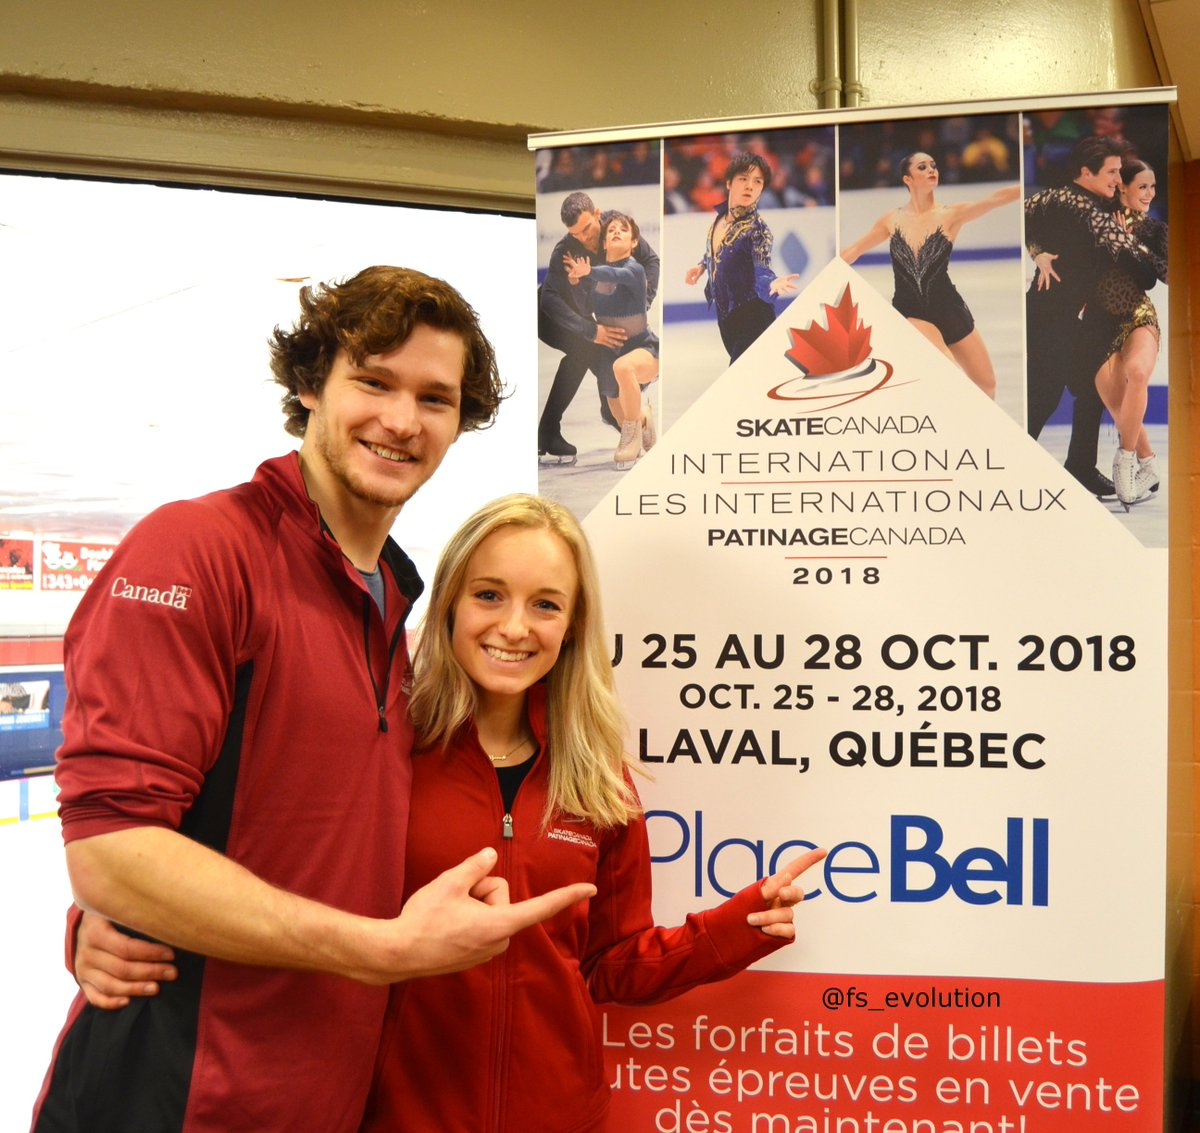 GP - 2 этап. Oct 26 - Oct 28 2018, Skate Canada, Laval, QC /CAN DpJ5G0zWsAET_-W